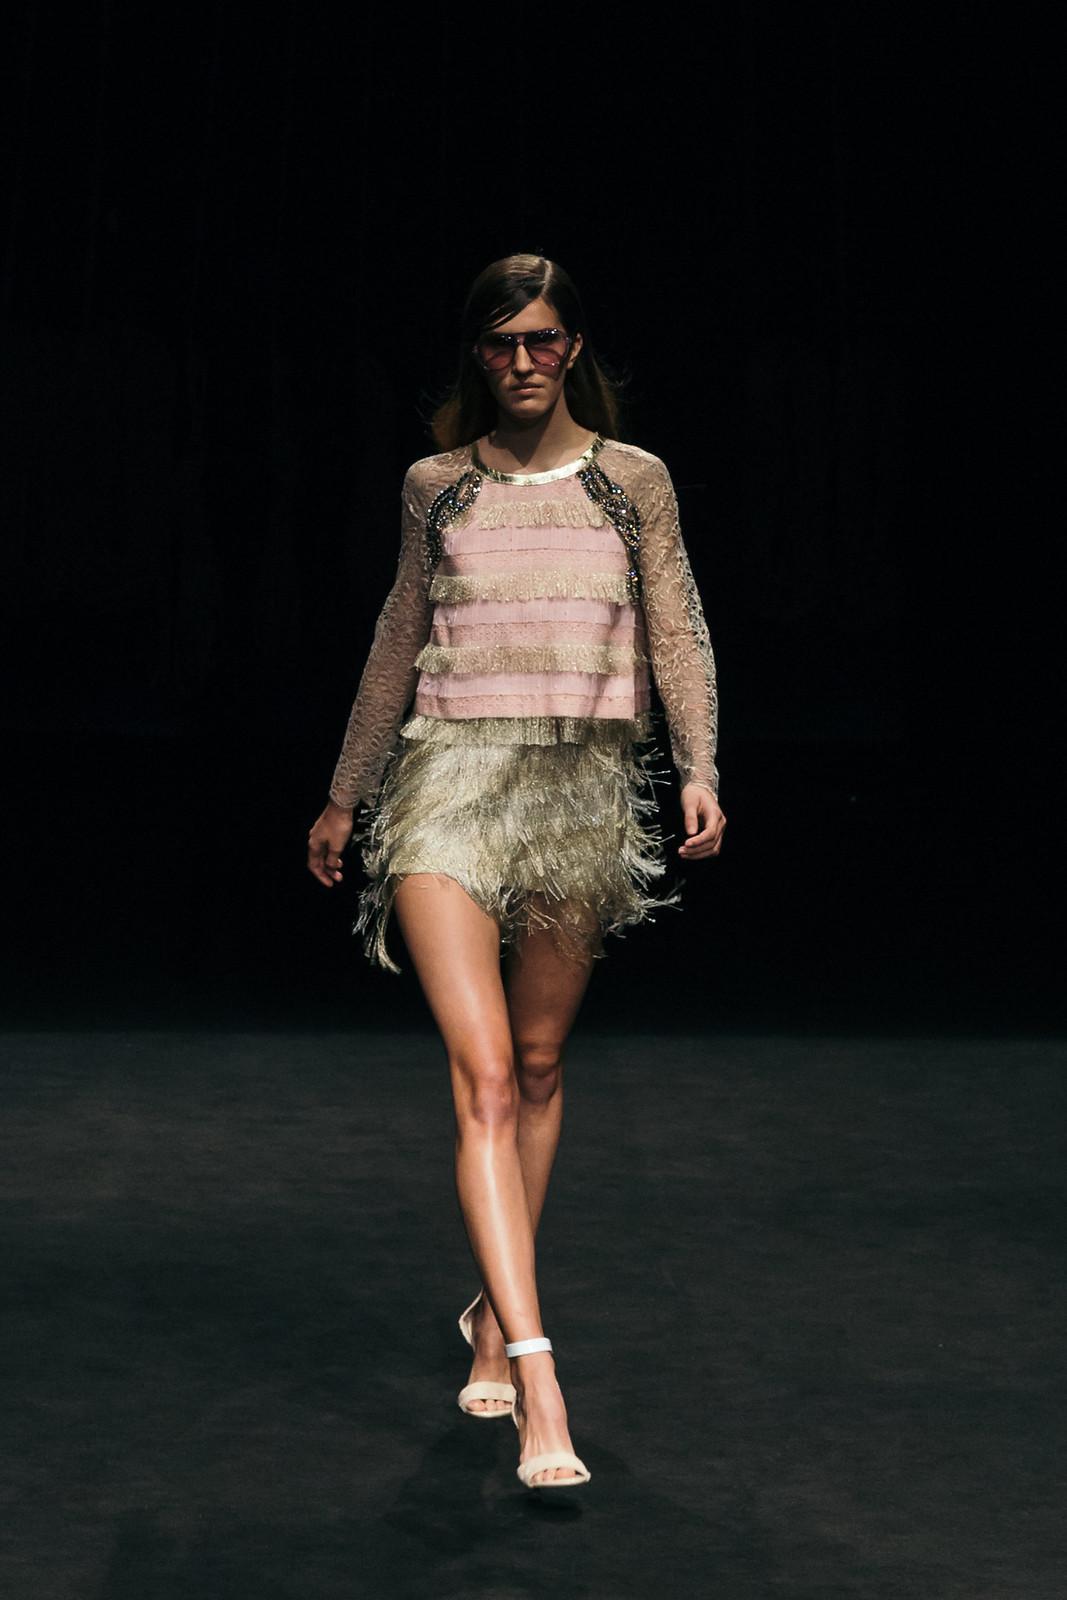 Jessie Chanes - Seams for a desire - 080 Bacelona Fashion #080bcnfasion -7